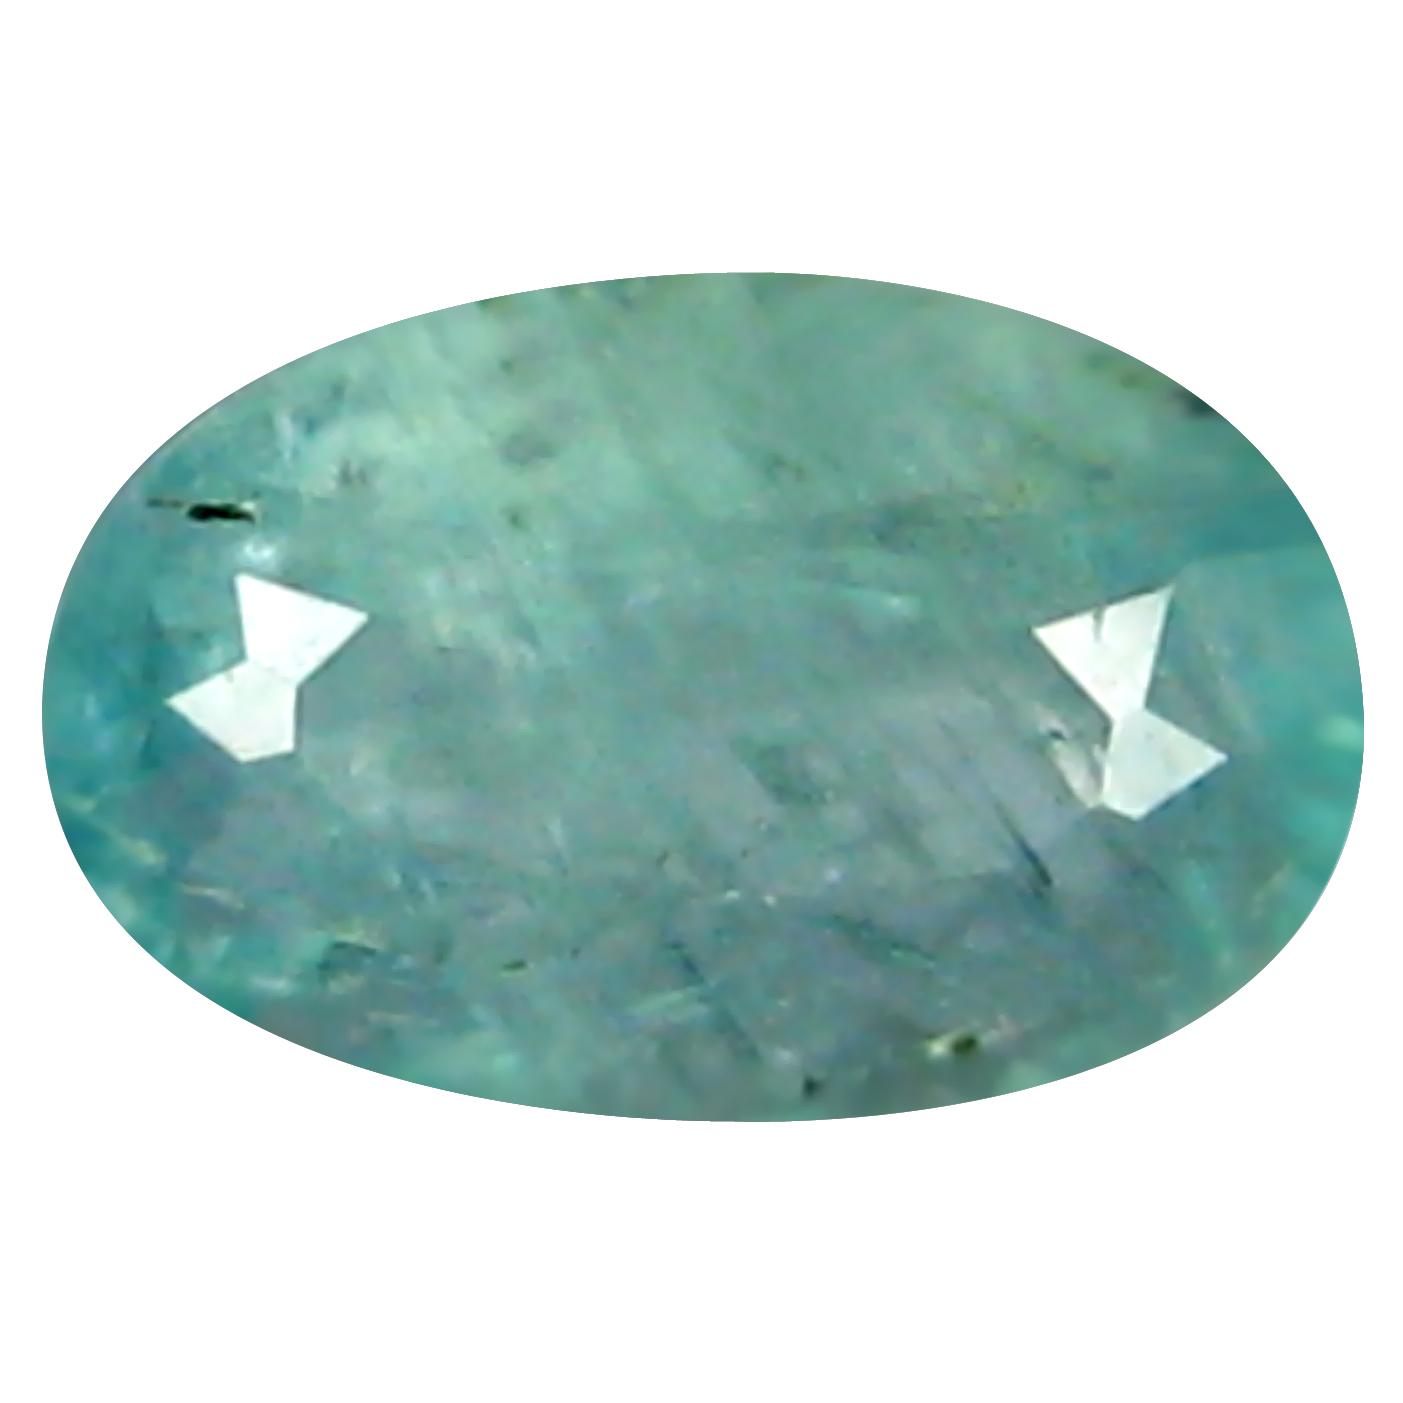 0.45 ct  Great looking Oval Shape (7 x 4 mm) Bluish Green Grandidierite Natural Gemstone